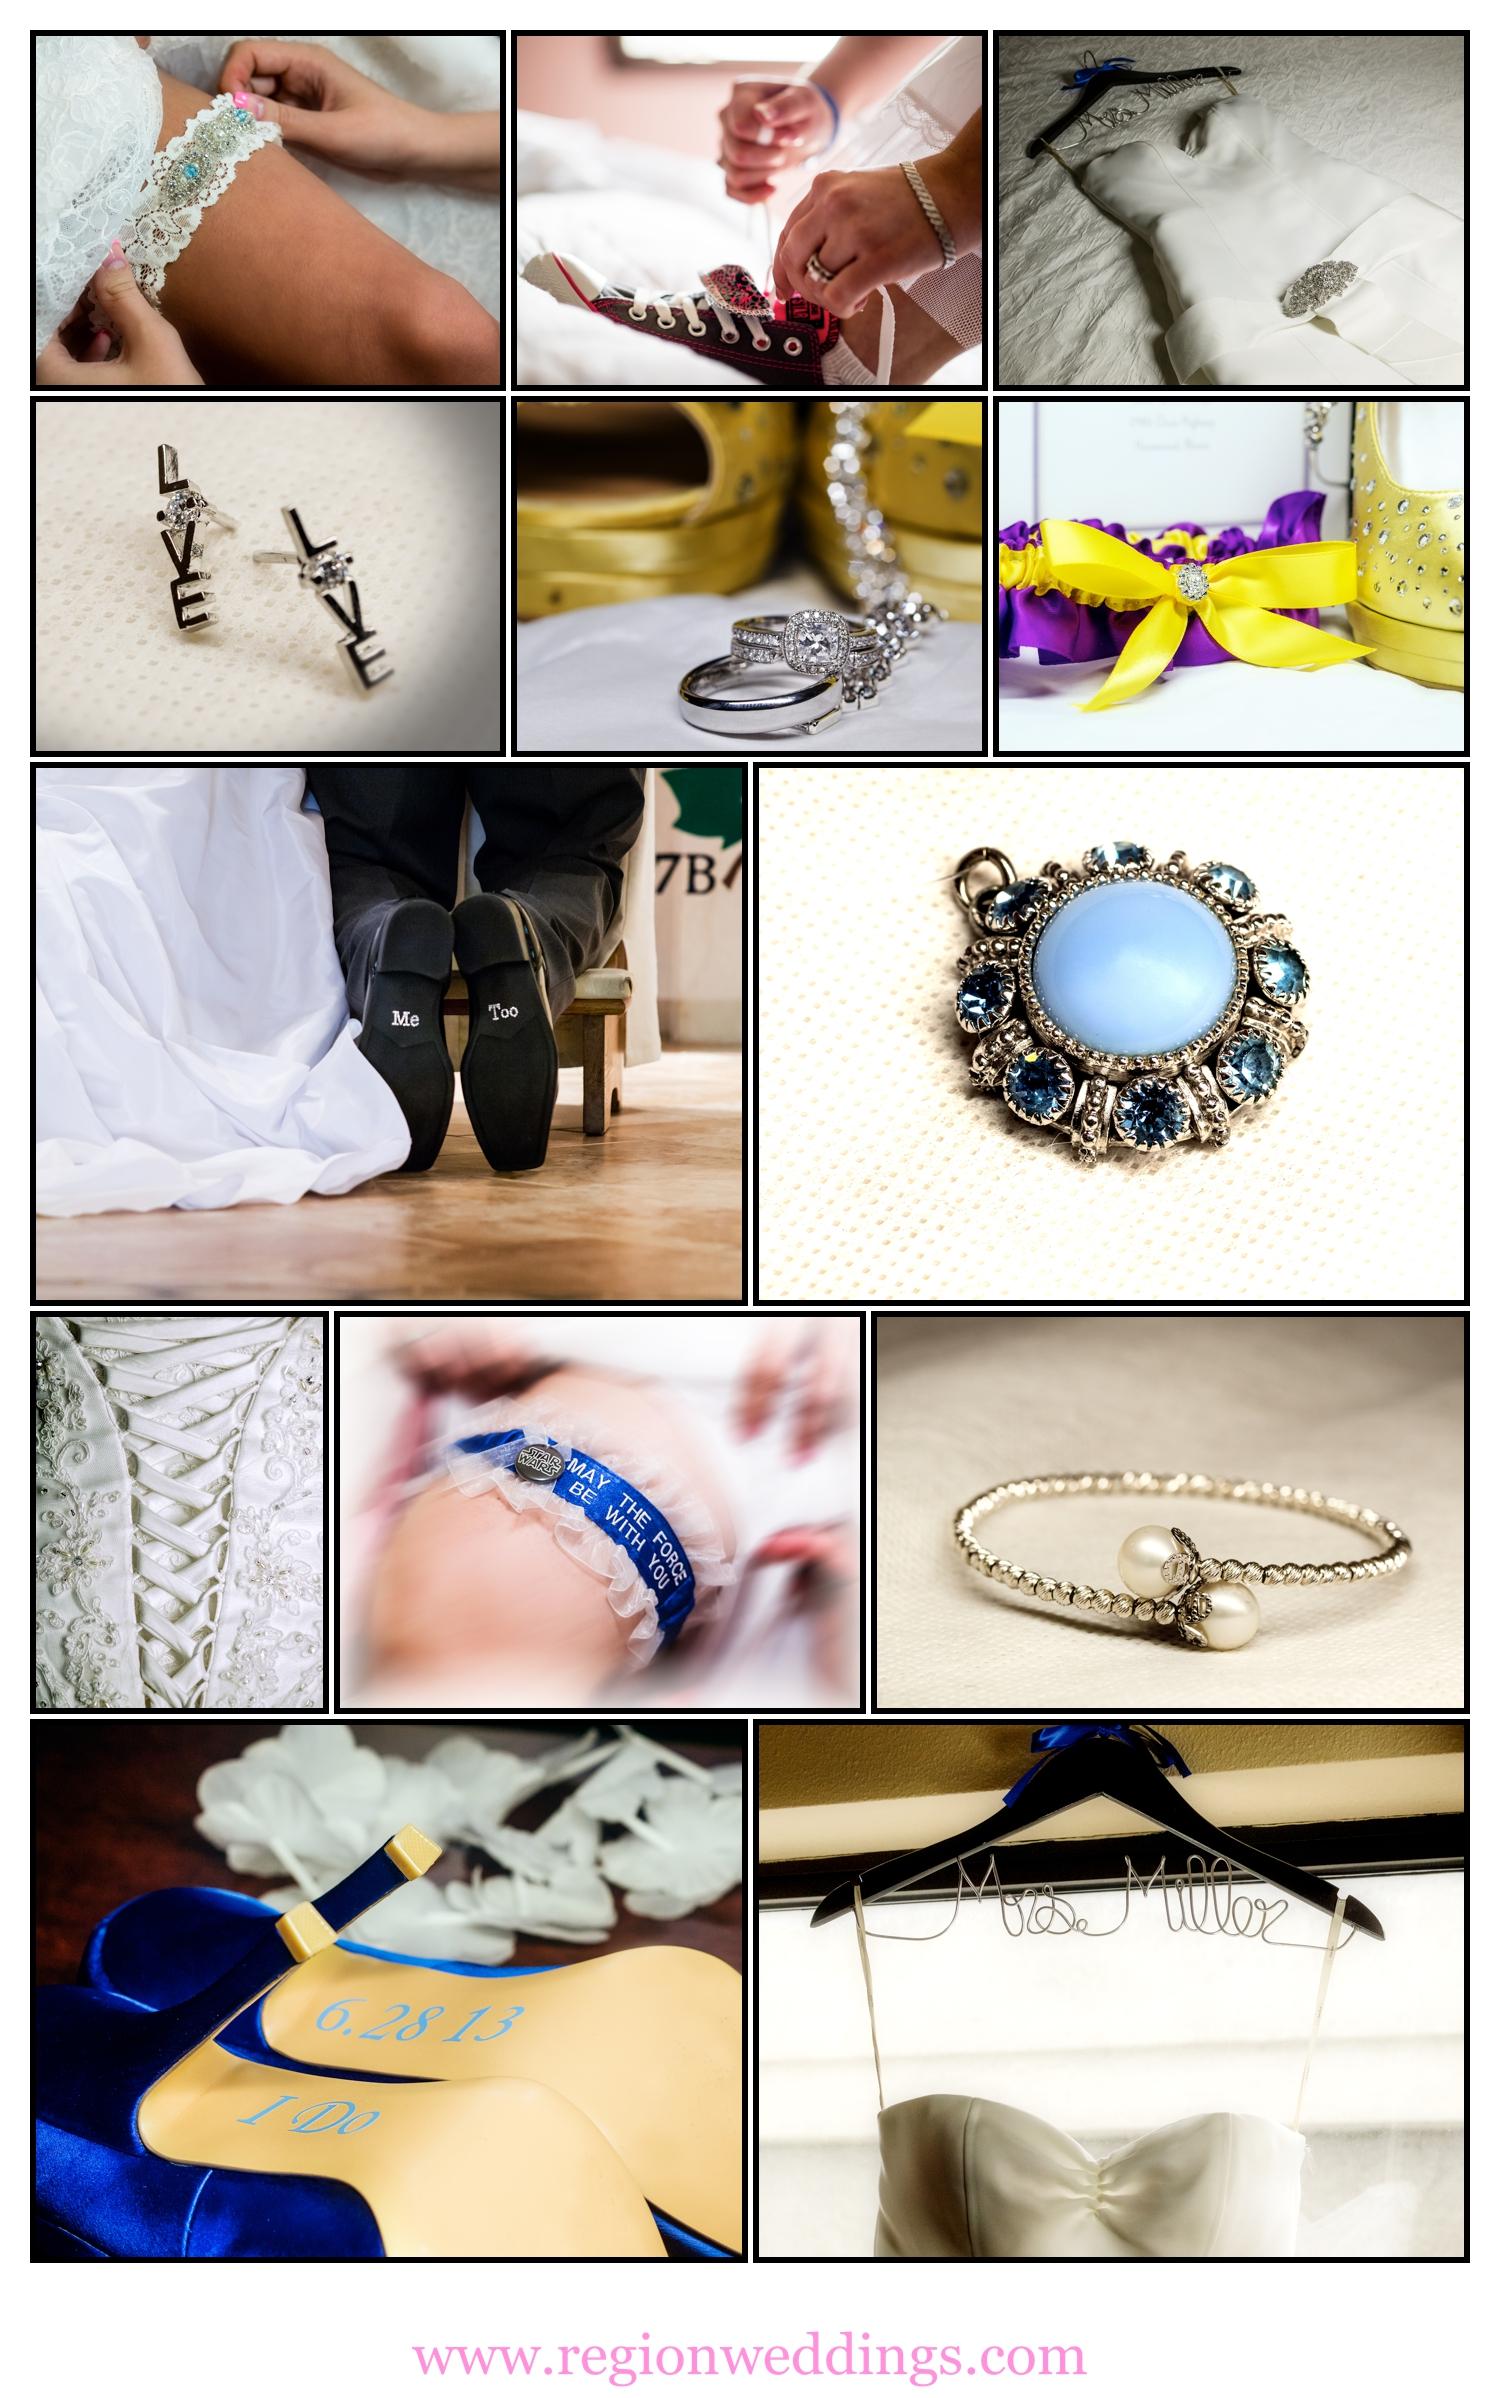 Wedding accessory photo collage.